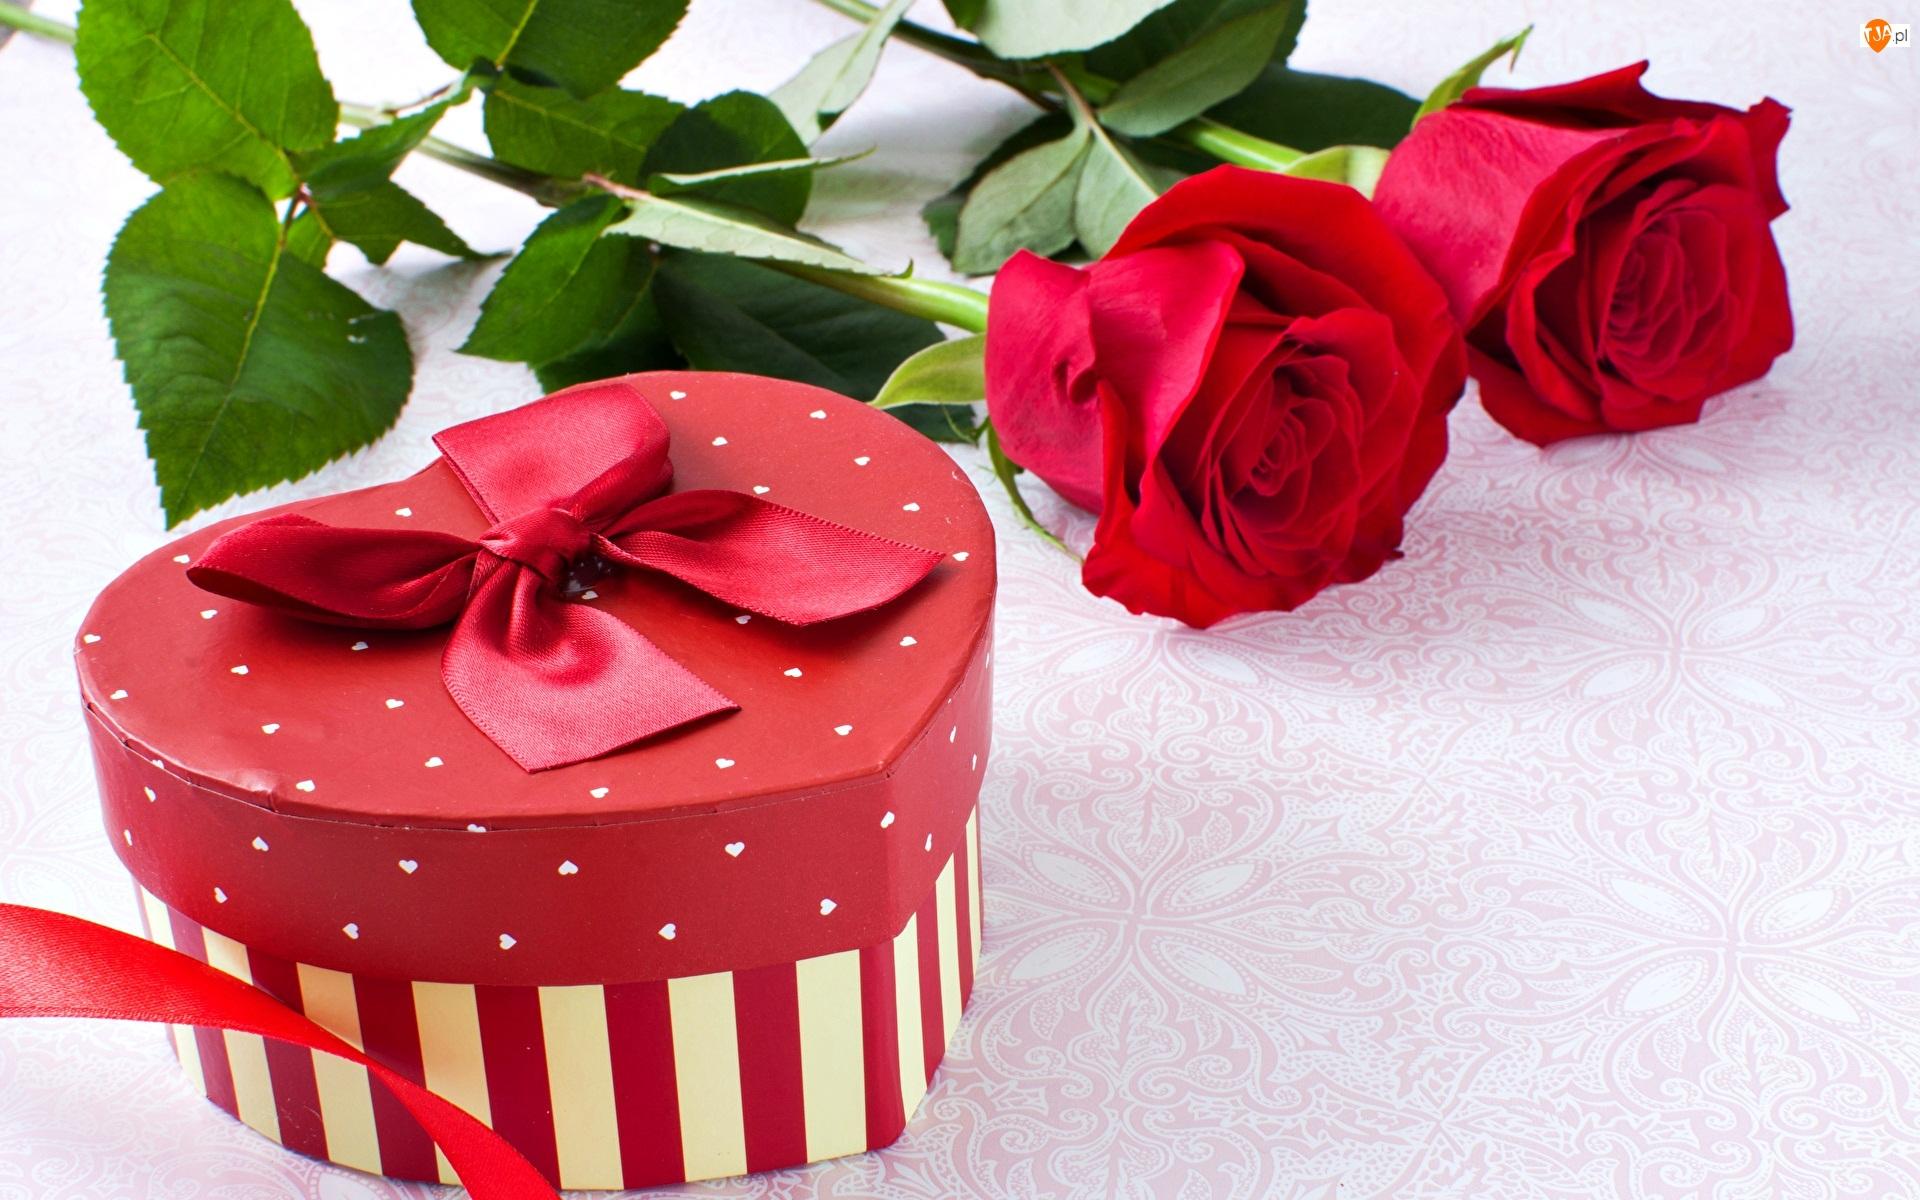 Pudełko, Kokarda, Róże, Czerwone, Serce